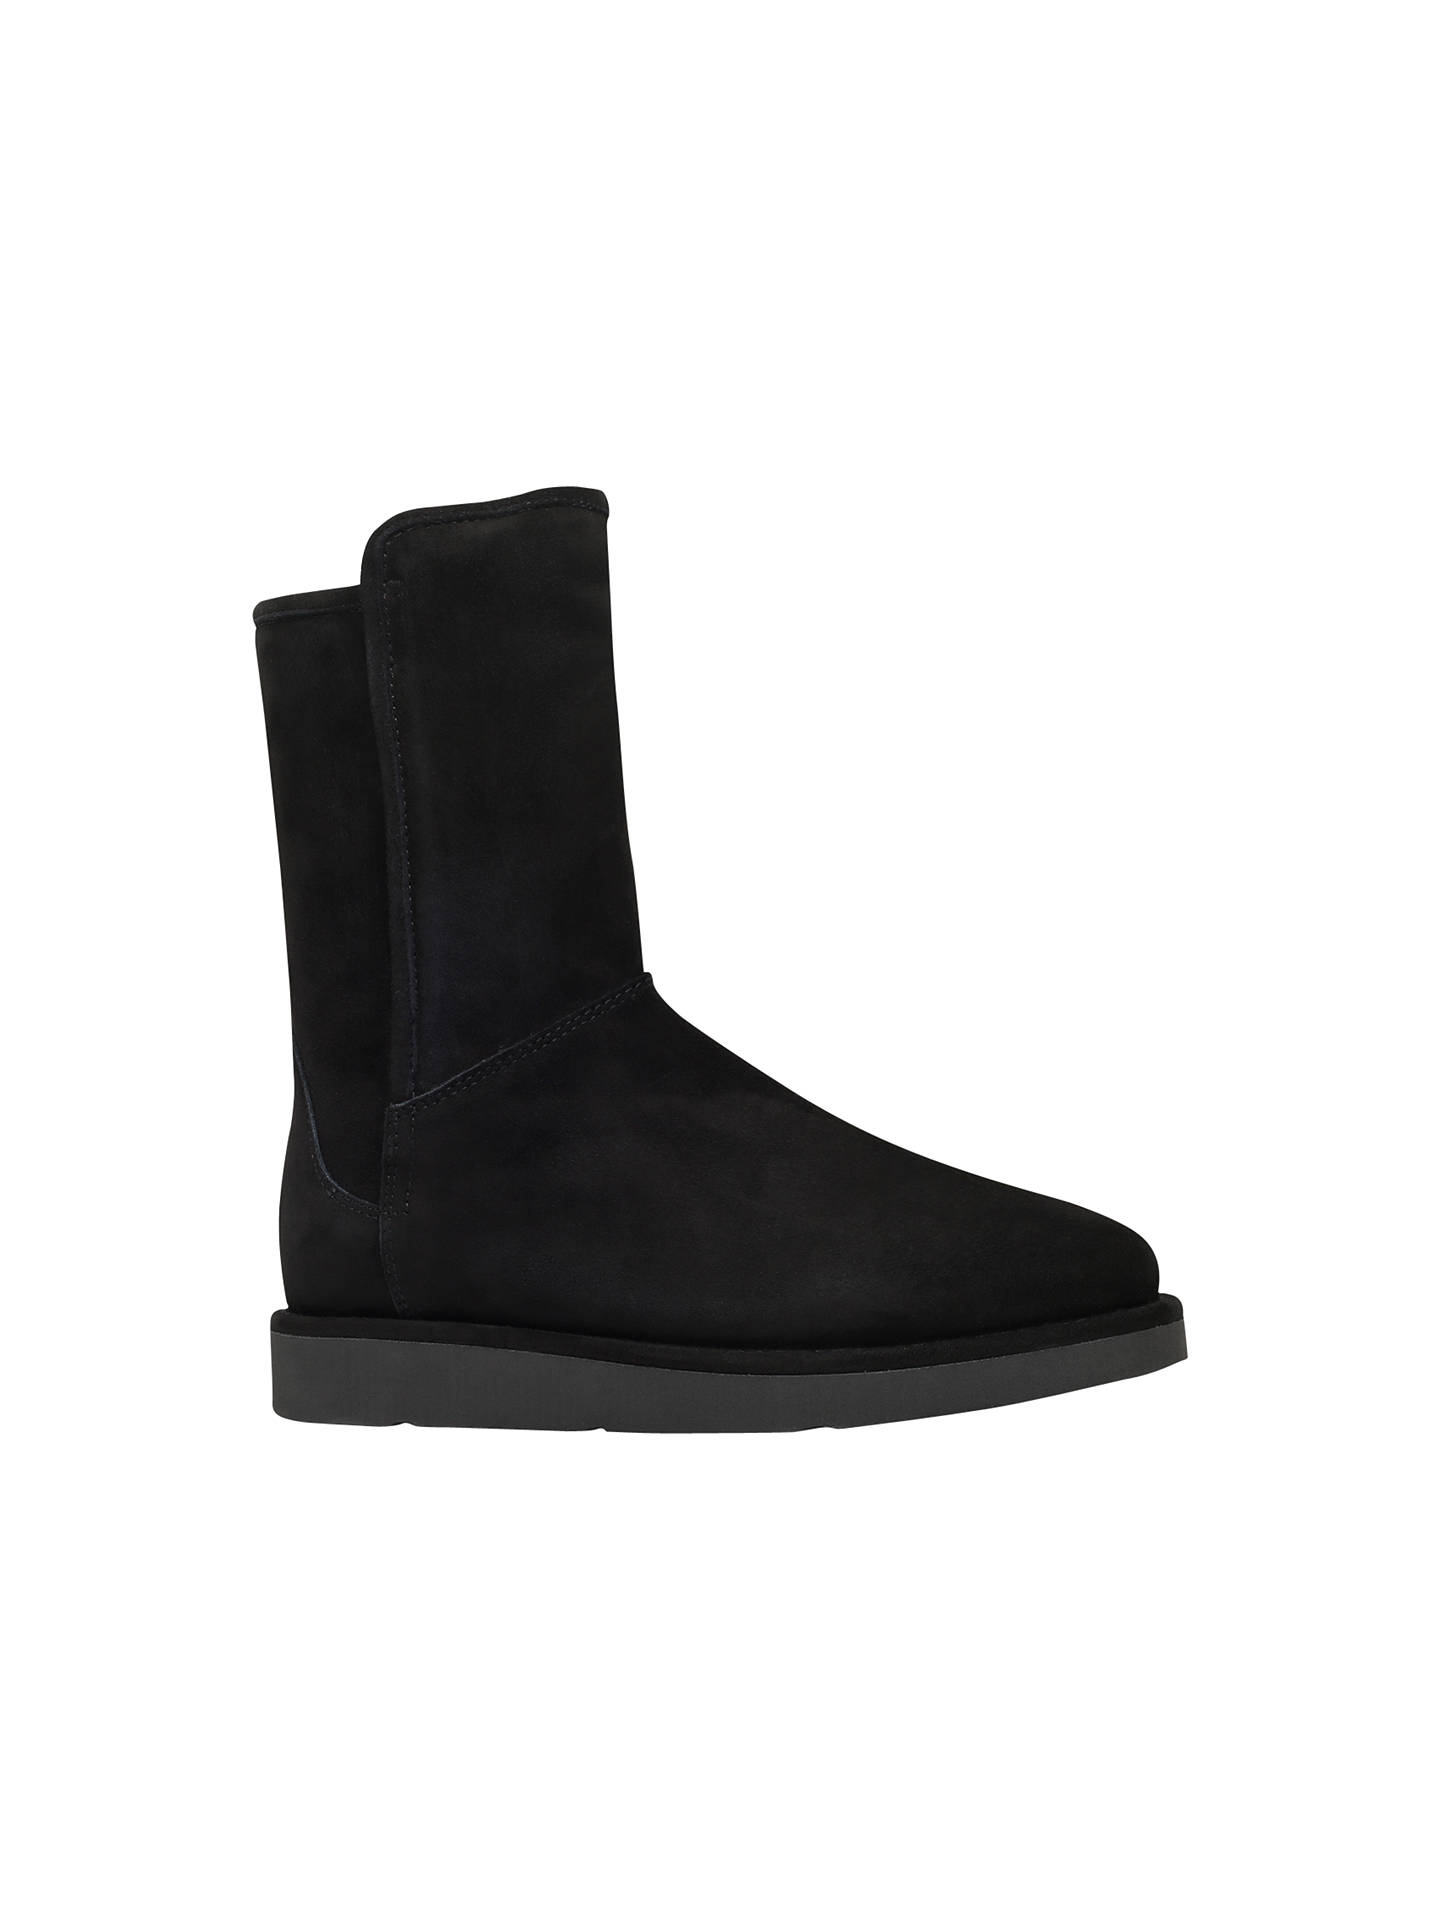 466b9441d7f UGG Abree Short Flat Calf Boots at John Lewis & Partners